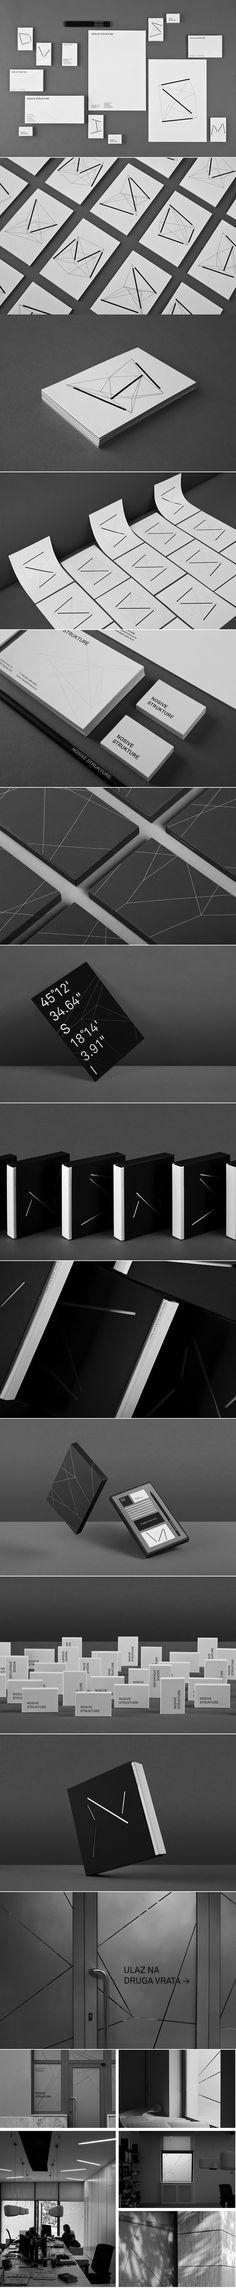 Nosive strukture by Bunch engineer design studio #branding #packaging PD